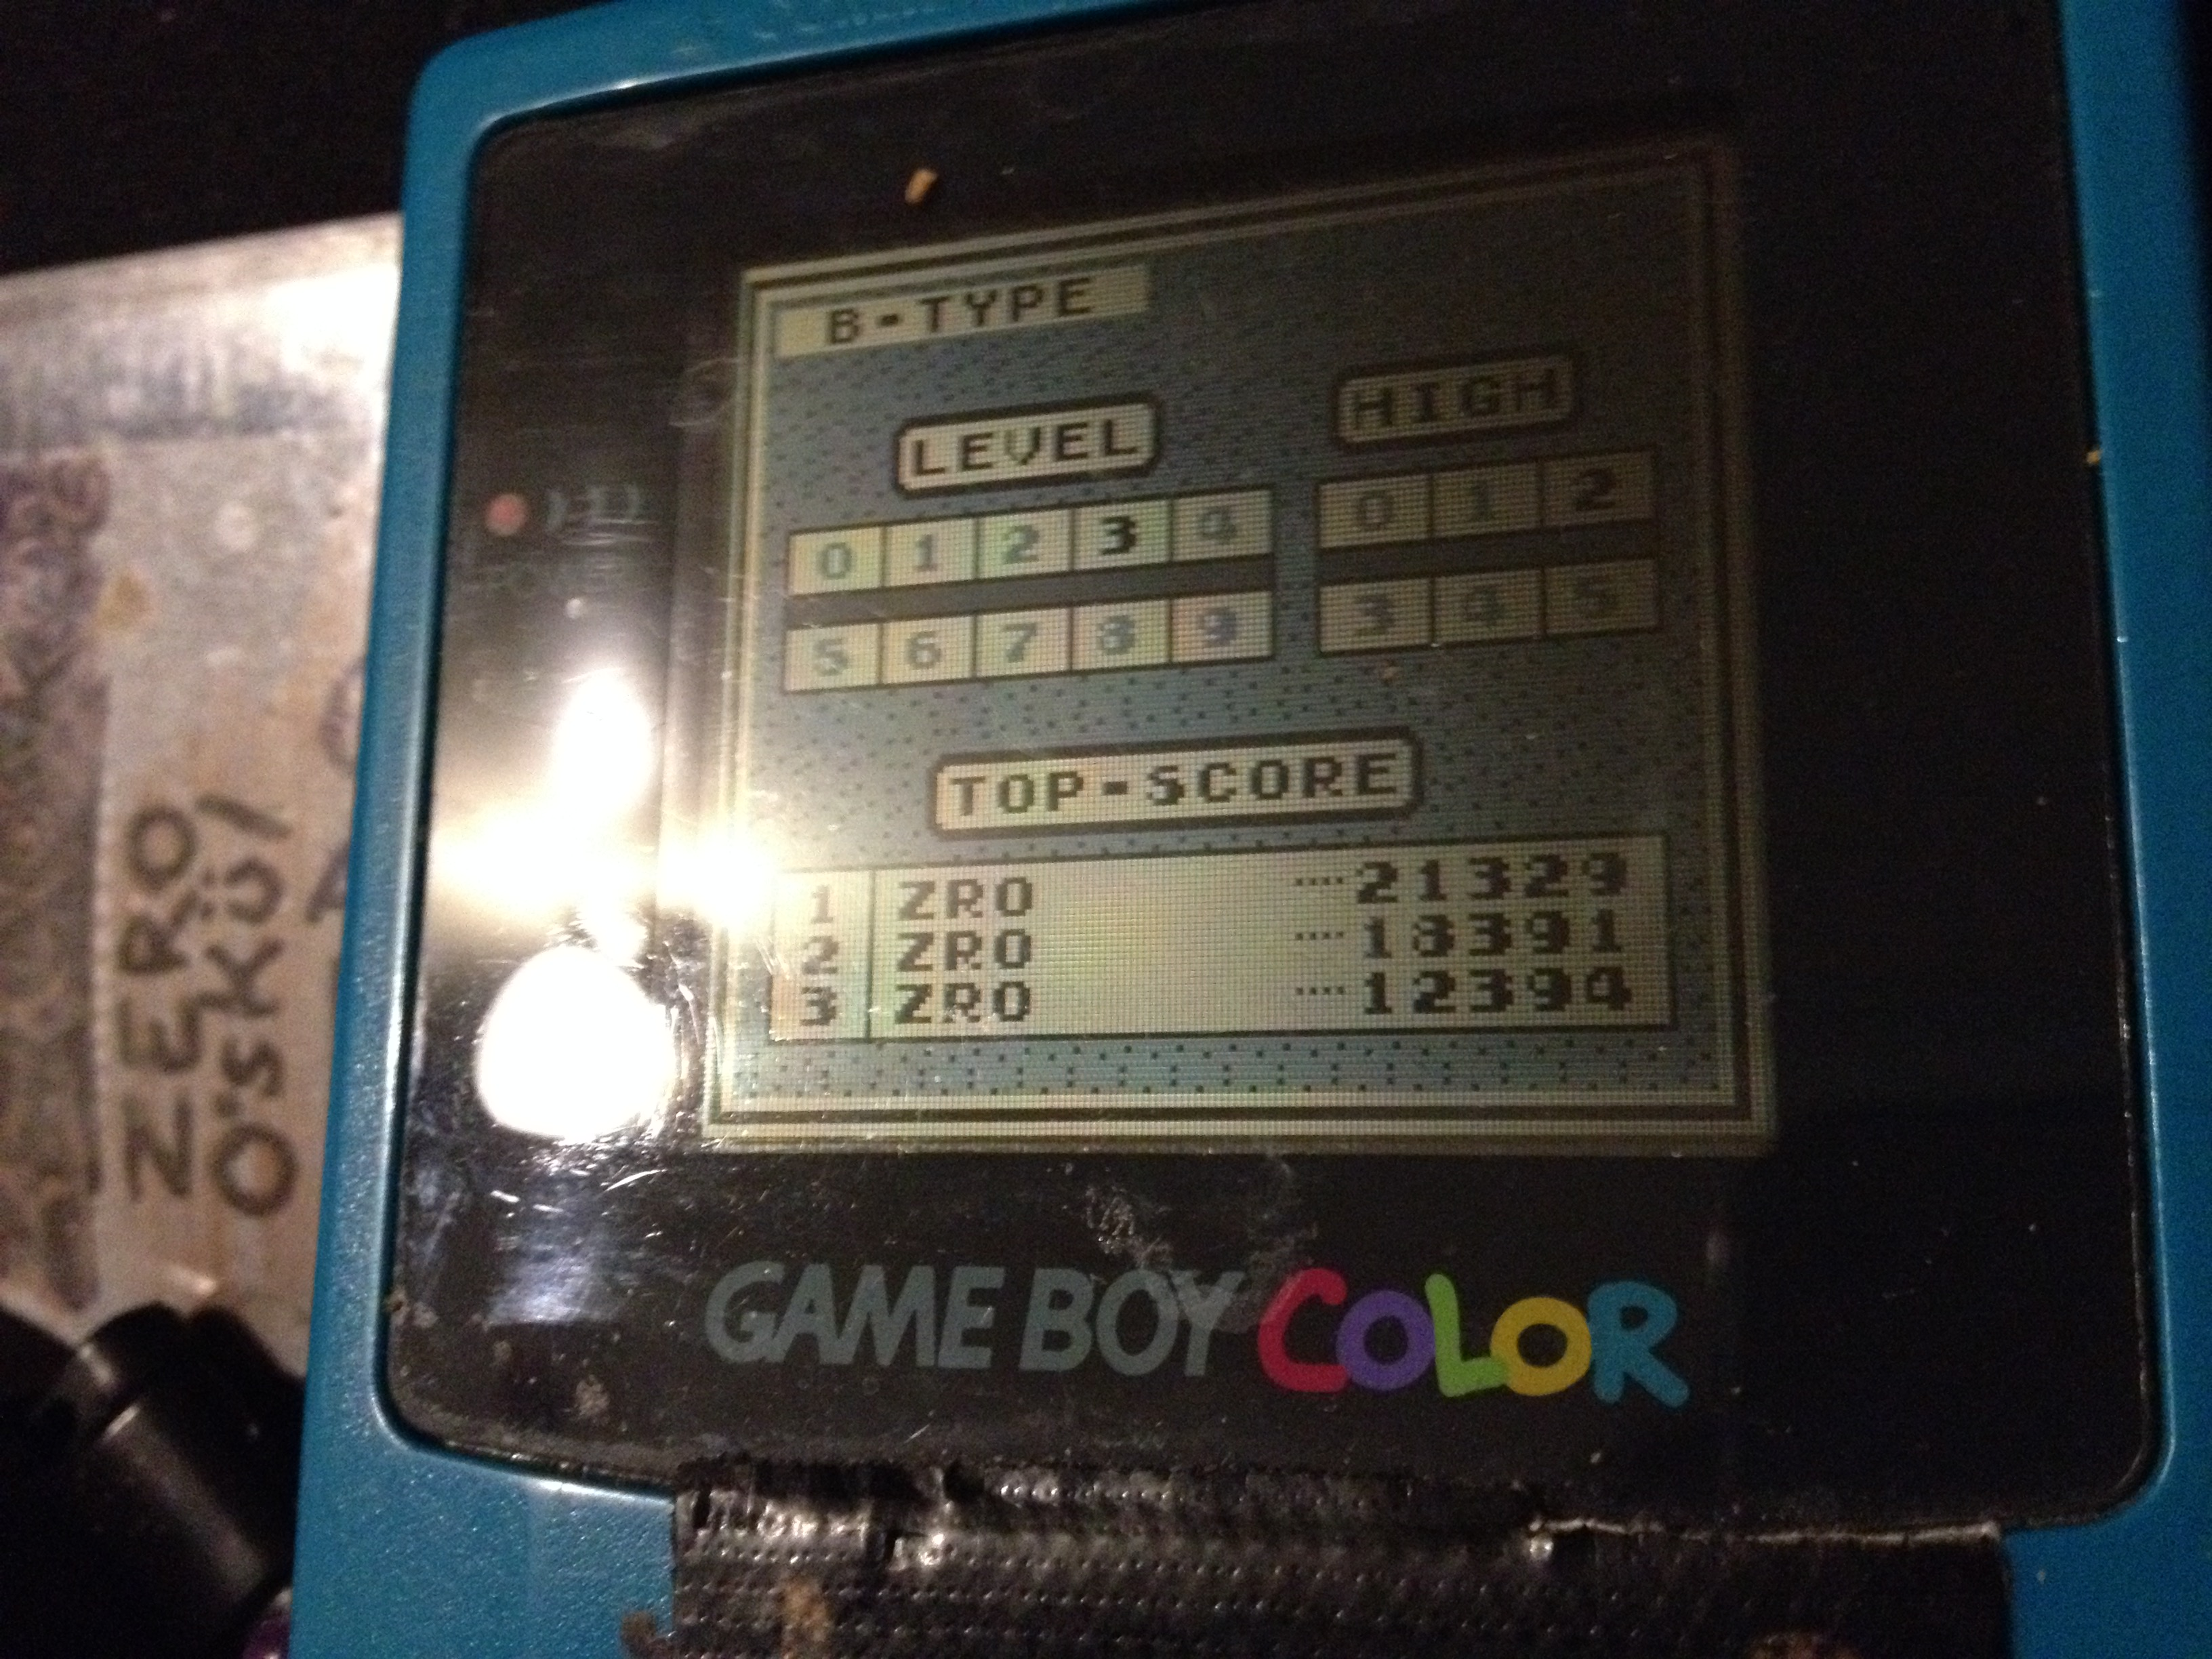 zerooskul: Tetris: Type B [Level 3 / High 2] (Game Boy) 21,329 points on 2019-12-06 22:25:55